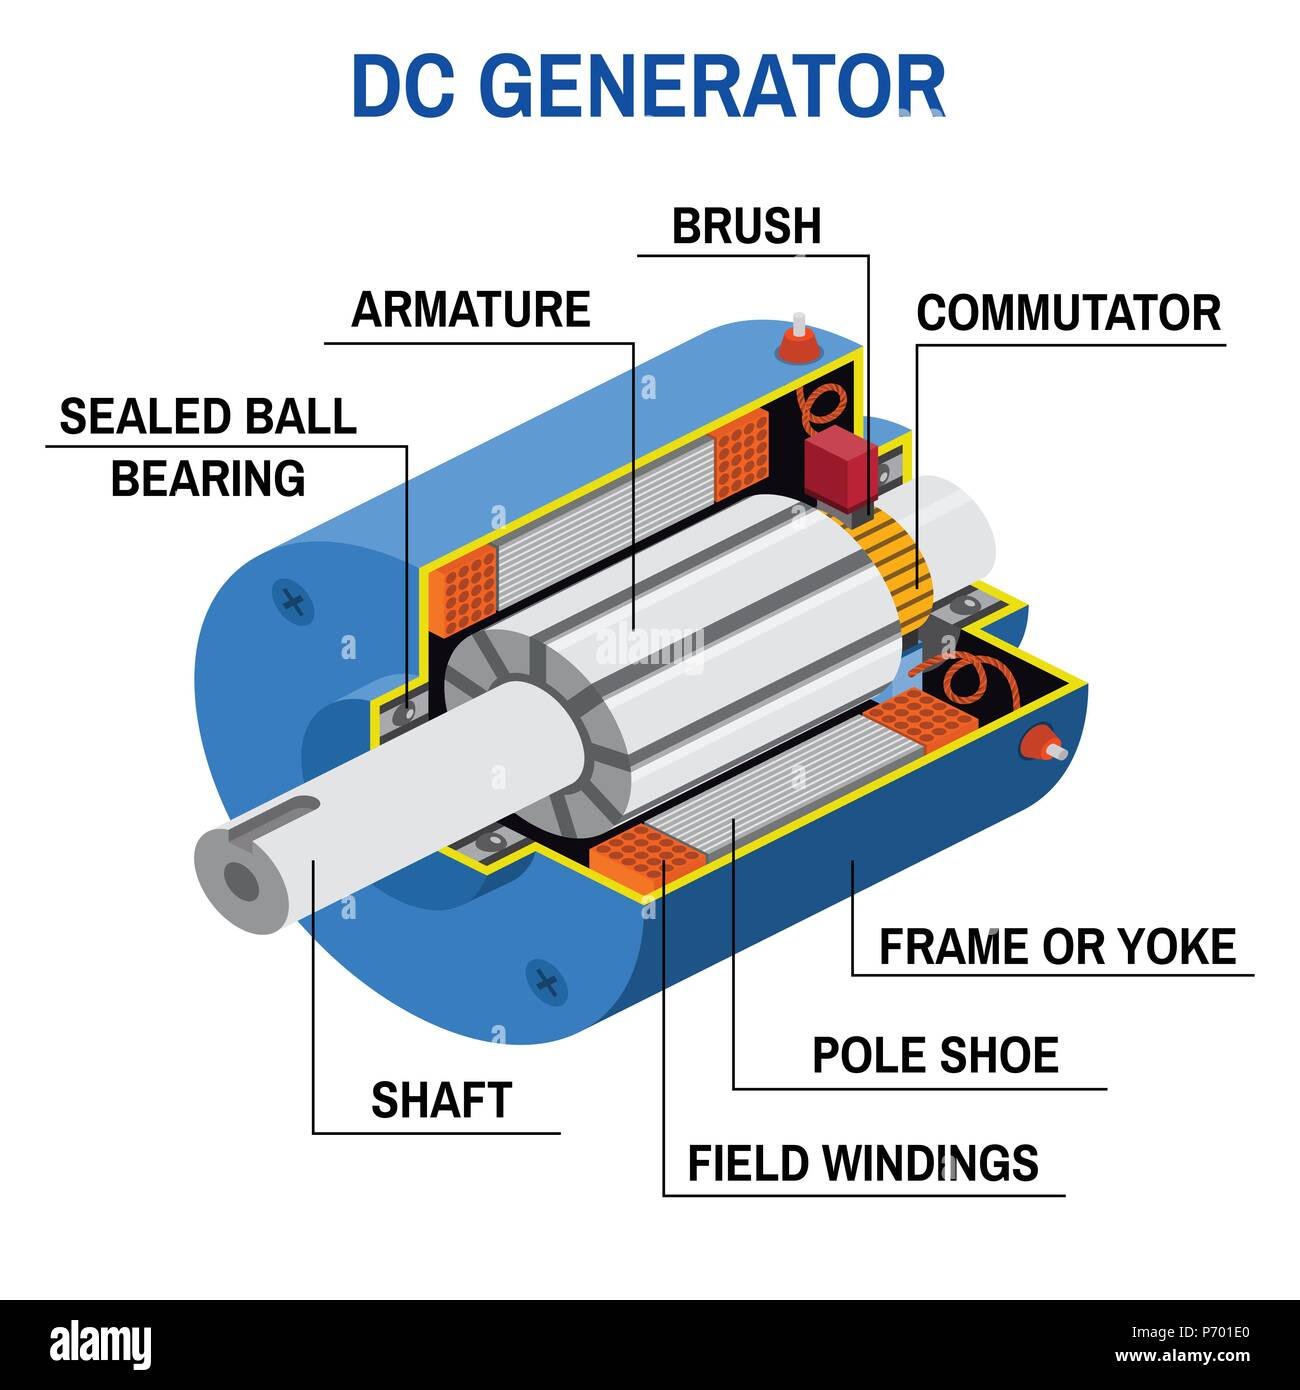 Dc    generator    cross    diagram    Simplified    diagram    of an offgrid system Vector illustration